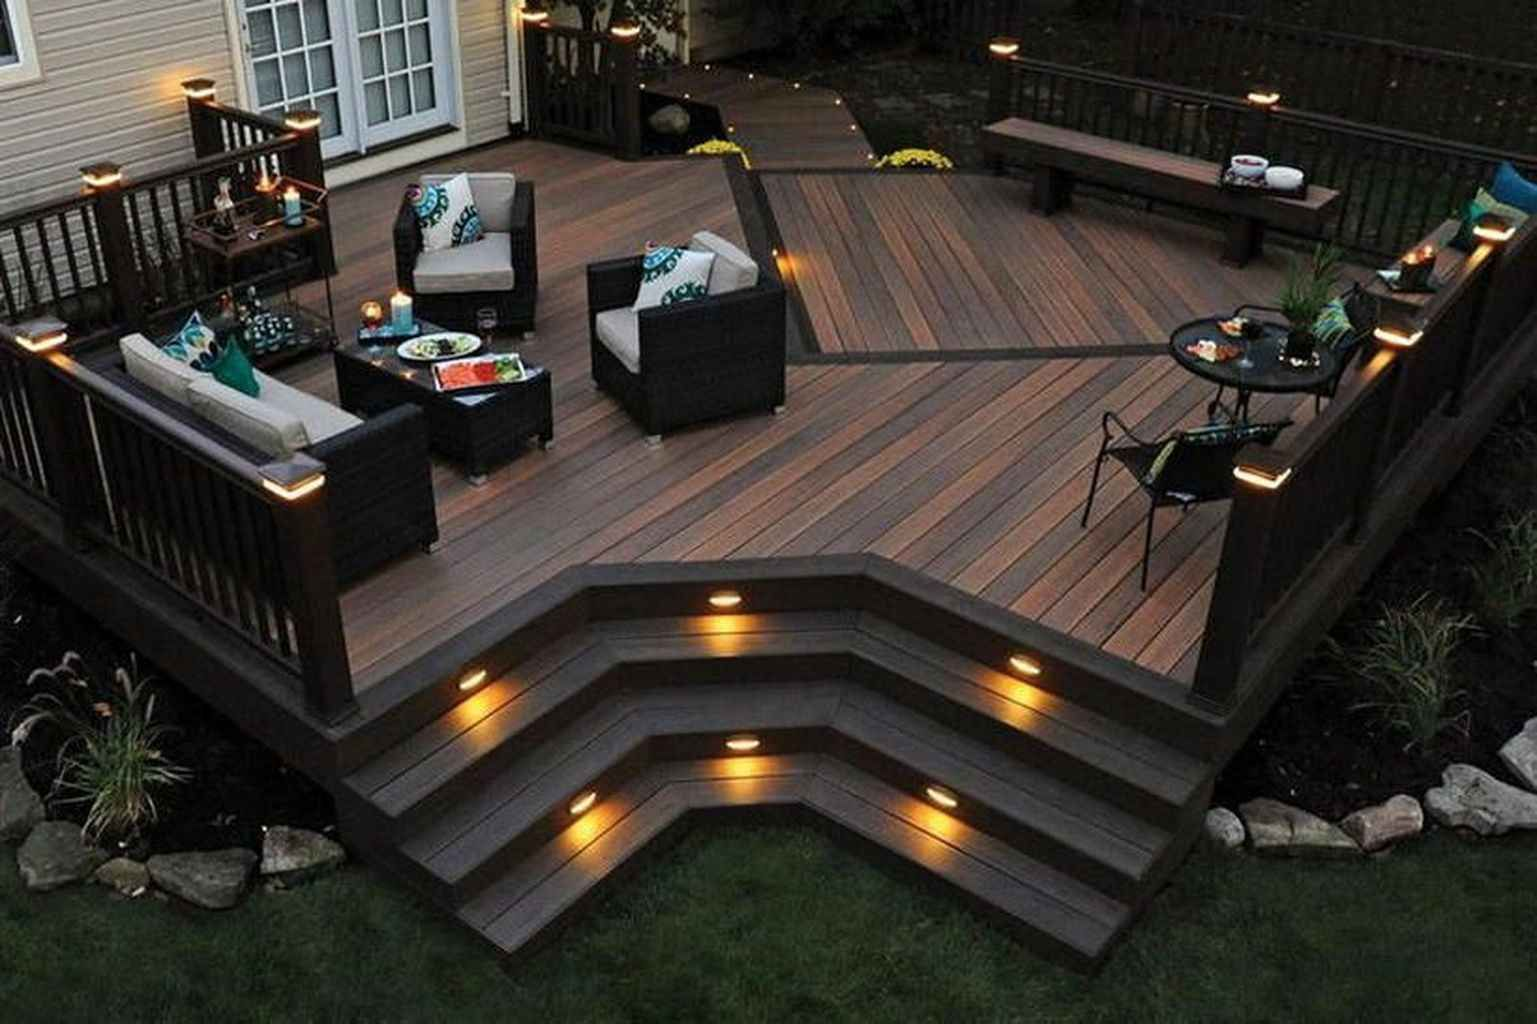 85 Best Backyard Patio Deck Design Ideas Homixover Com Patio Design Patio Deck Designs Deck Designs Backyard